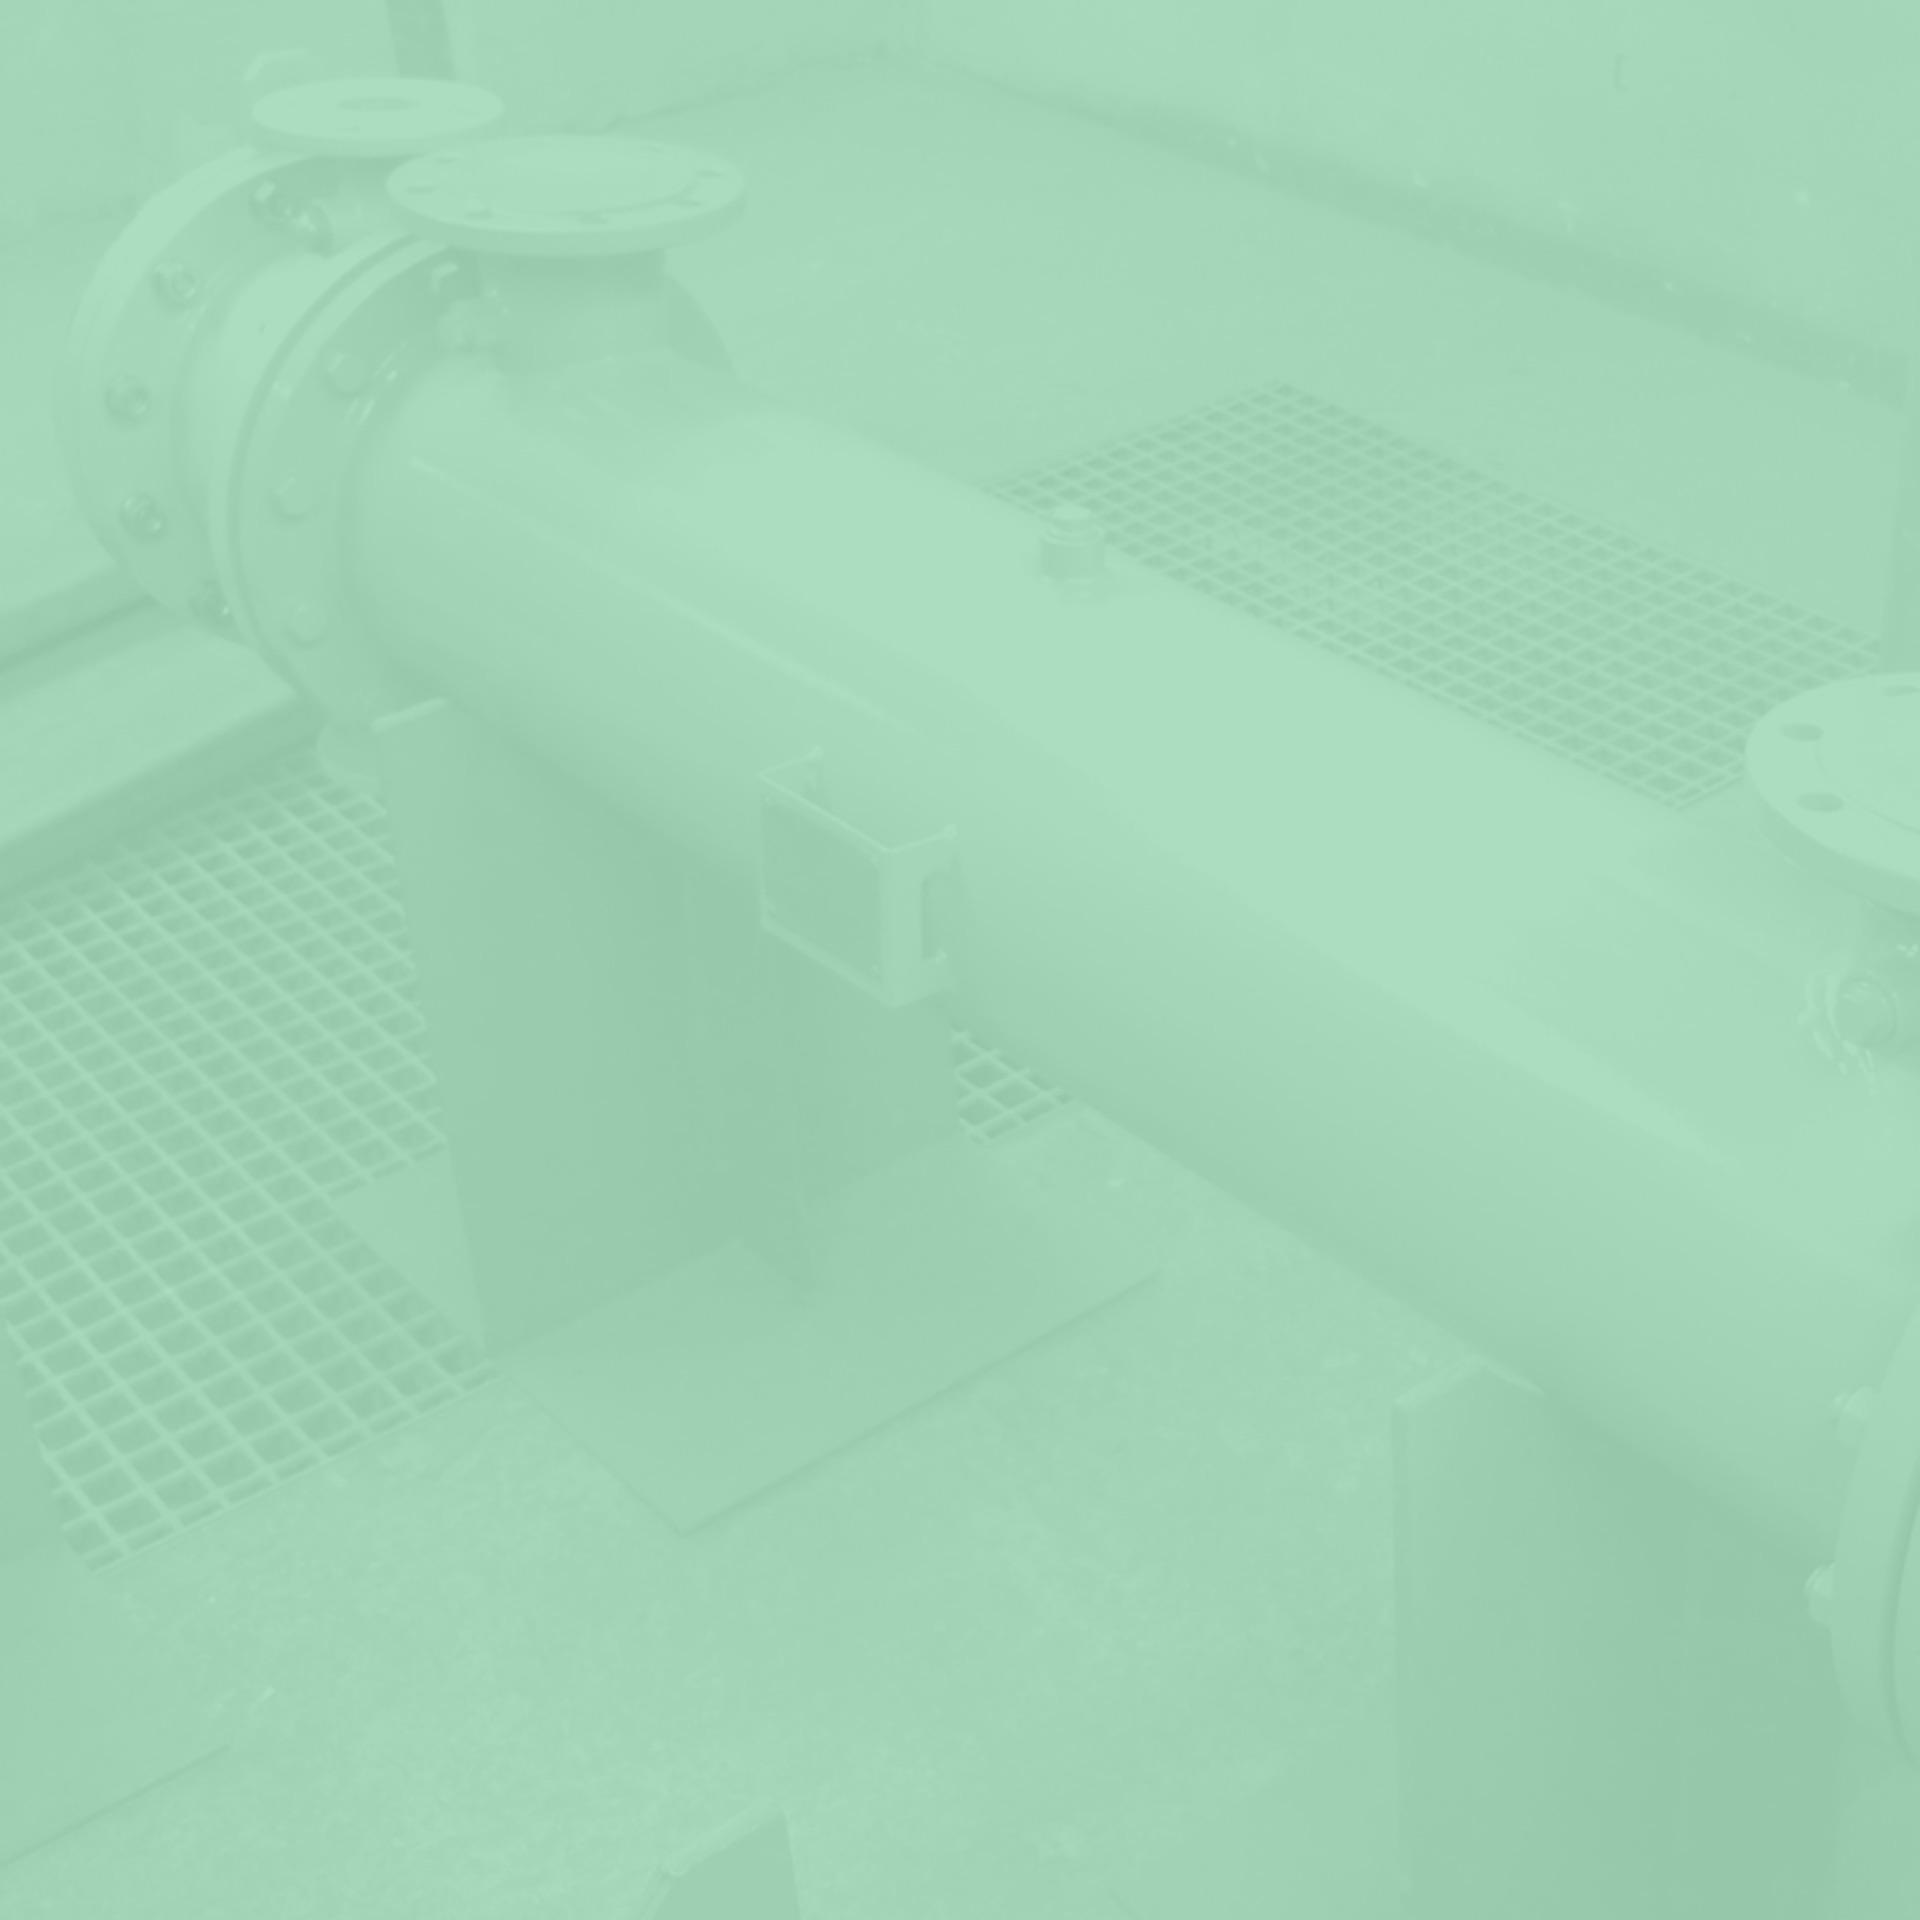 GWA_heat_exchanger_tube_bundle_heat_exchanger_oil_water_cooler_with_drawable_tube_bundle_2_Gesellschaft_fuer_Waerme_und_Anlagentechnik_mbH_monochrom